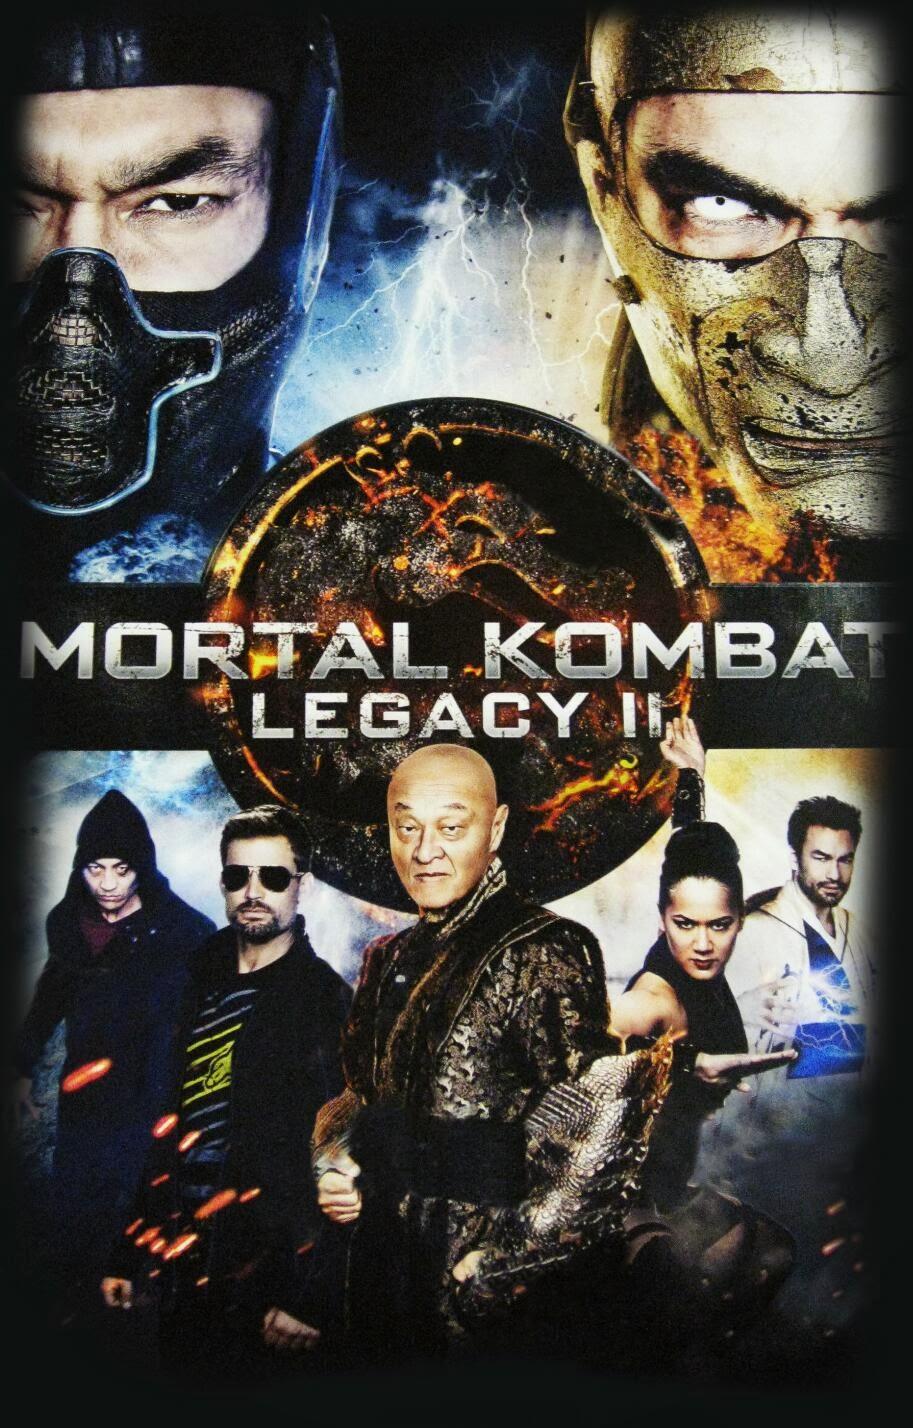 Download – Mortal Kombat Legacy – S02E01 – WEBRip